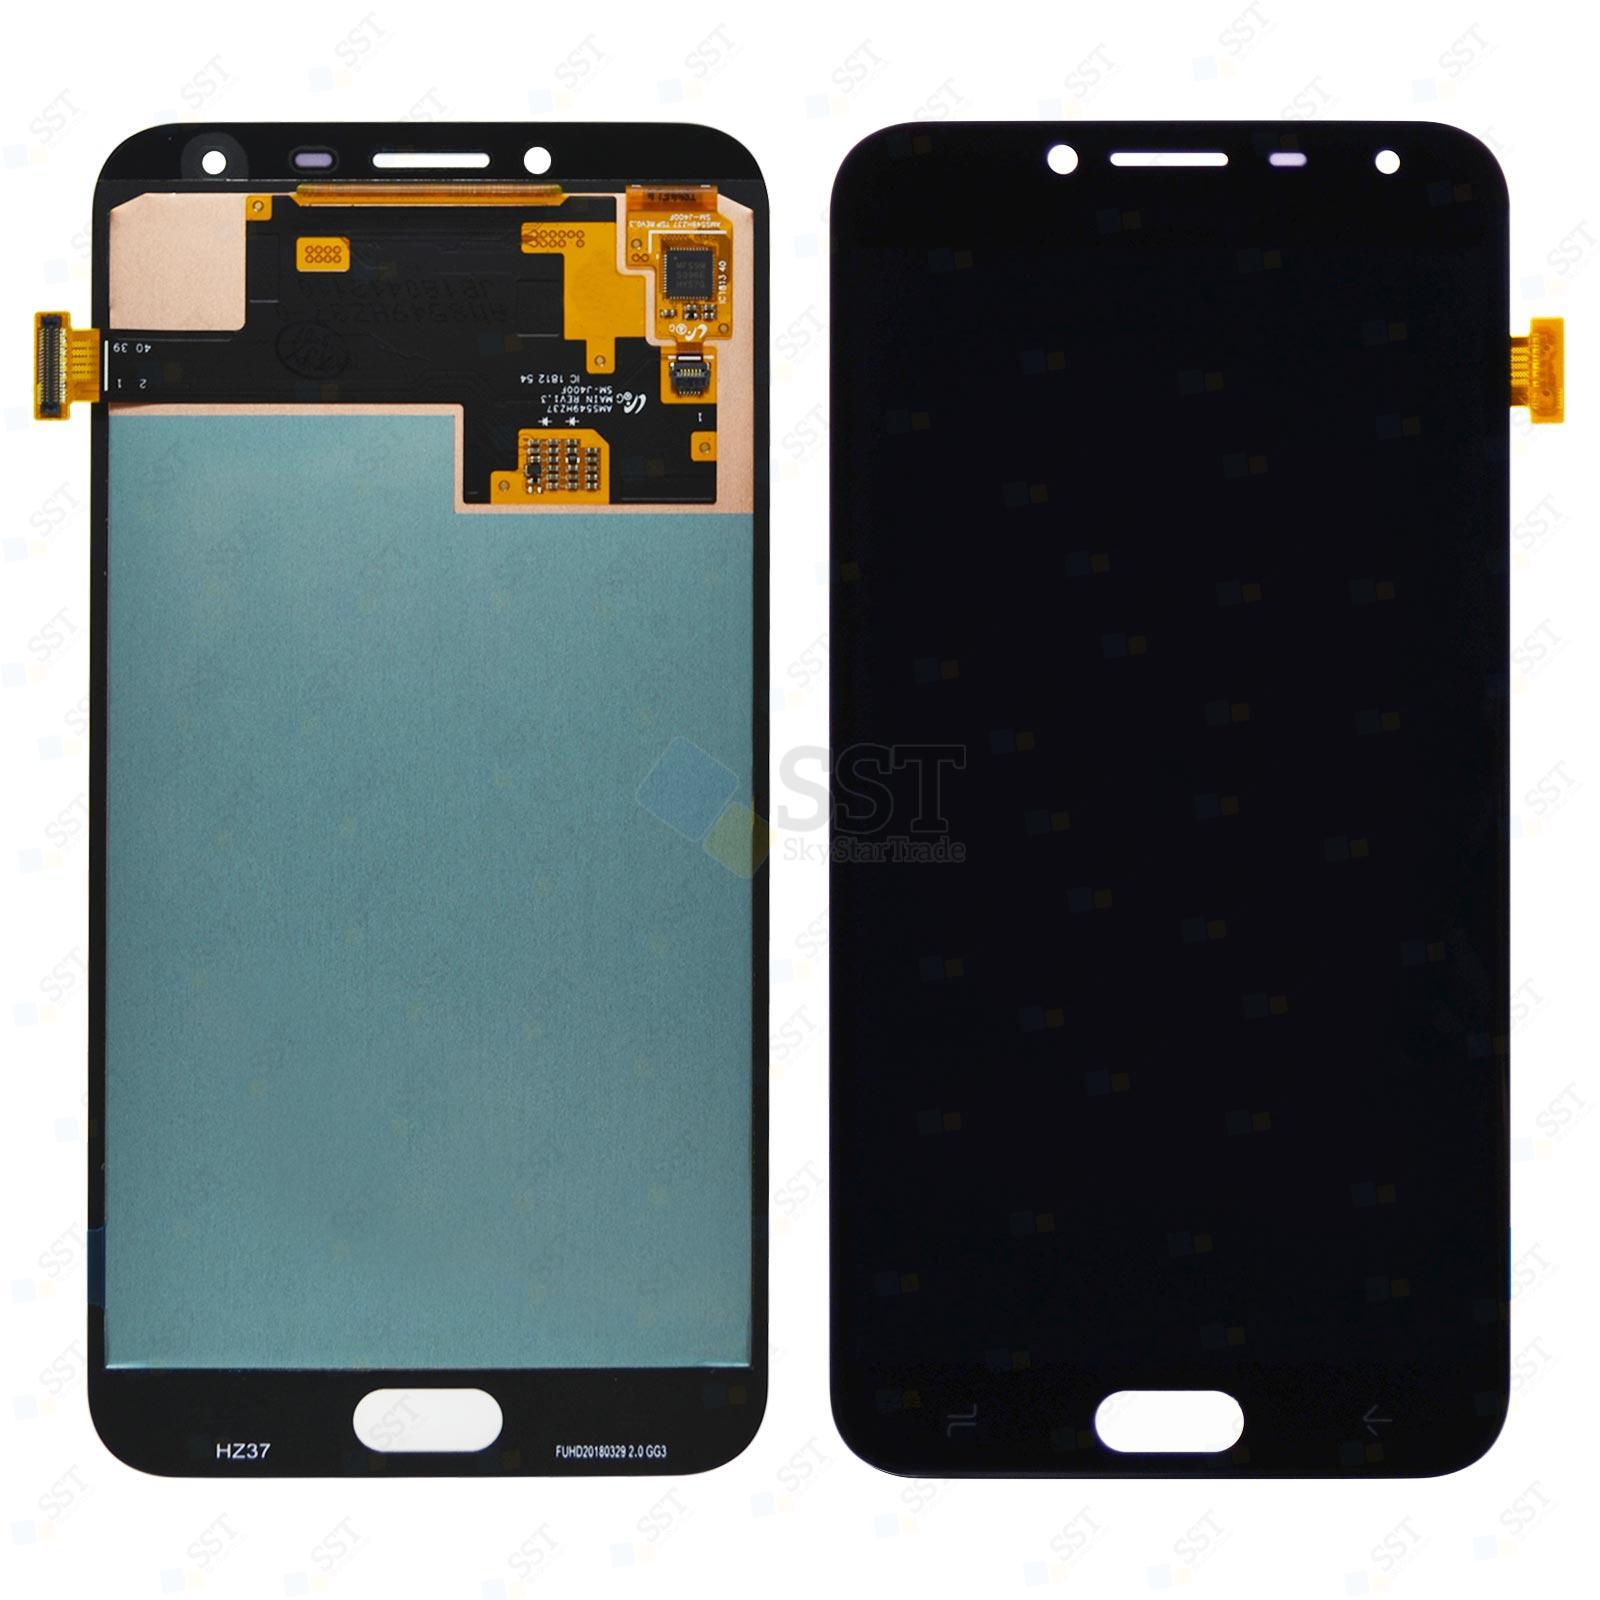 Samsung Galaxy J4 2018 J400F/DS J400G J400G/DS J400M J400M/DS LCD Screen Digitizer, Black